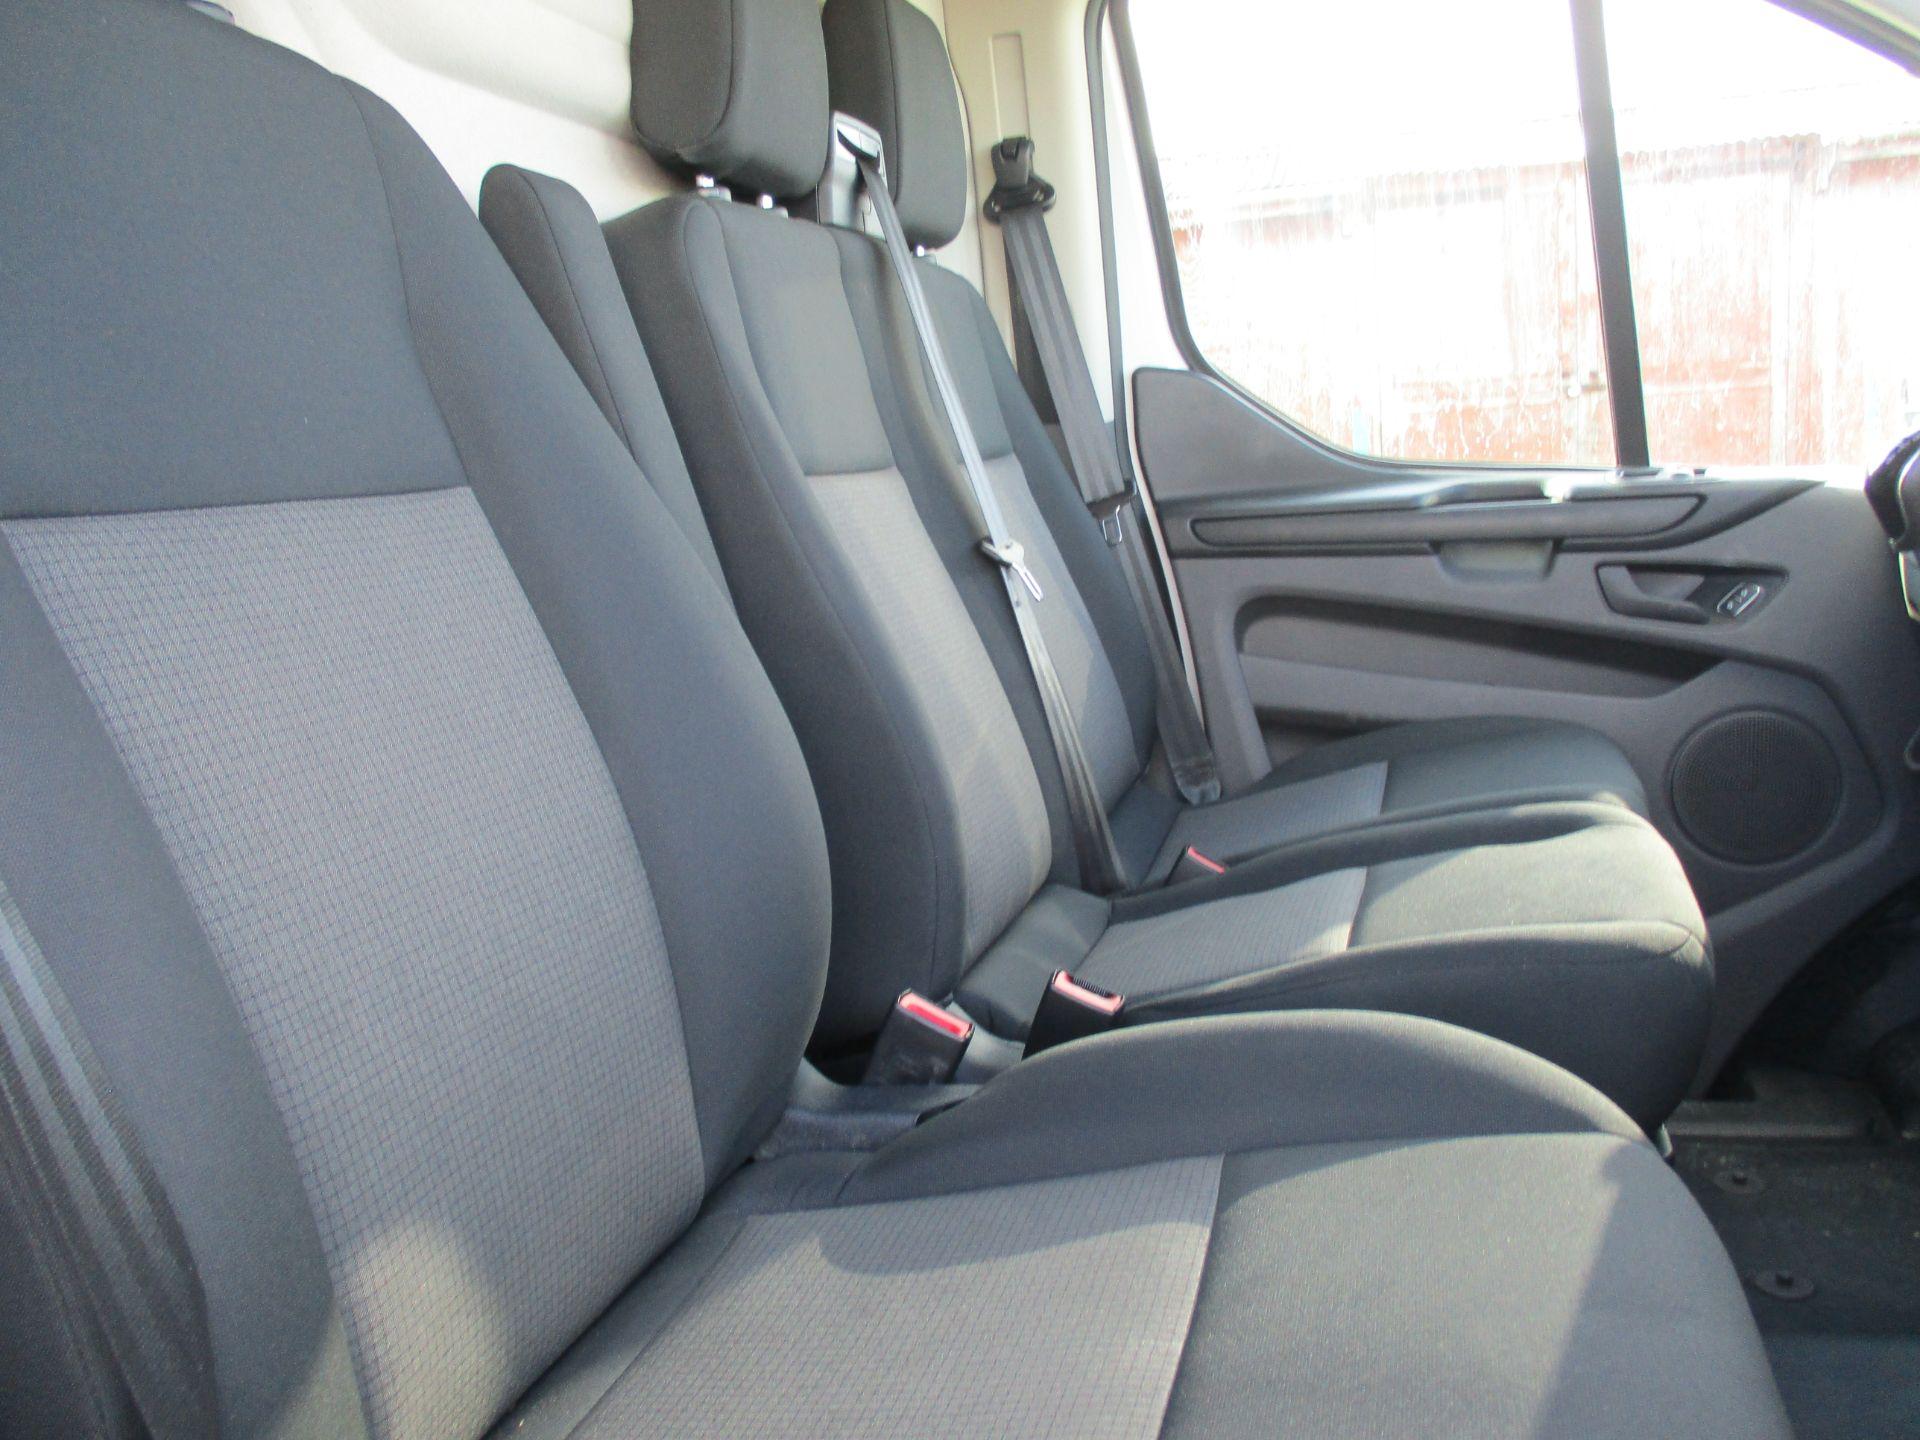 2018 Ford Transit Custom 300 L1 DIESEL FWD 2.0 TDCI 105PS LOW ROOF VAN EURO 6 (FL68AHN) Image 12